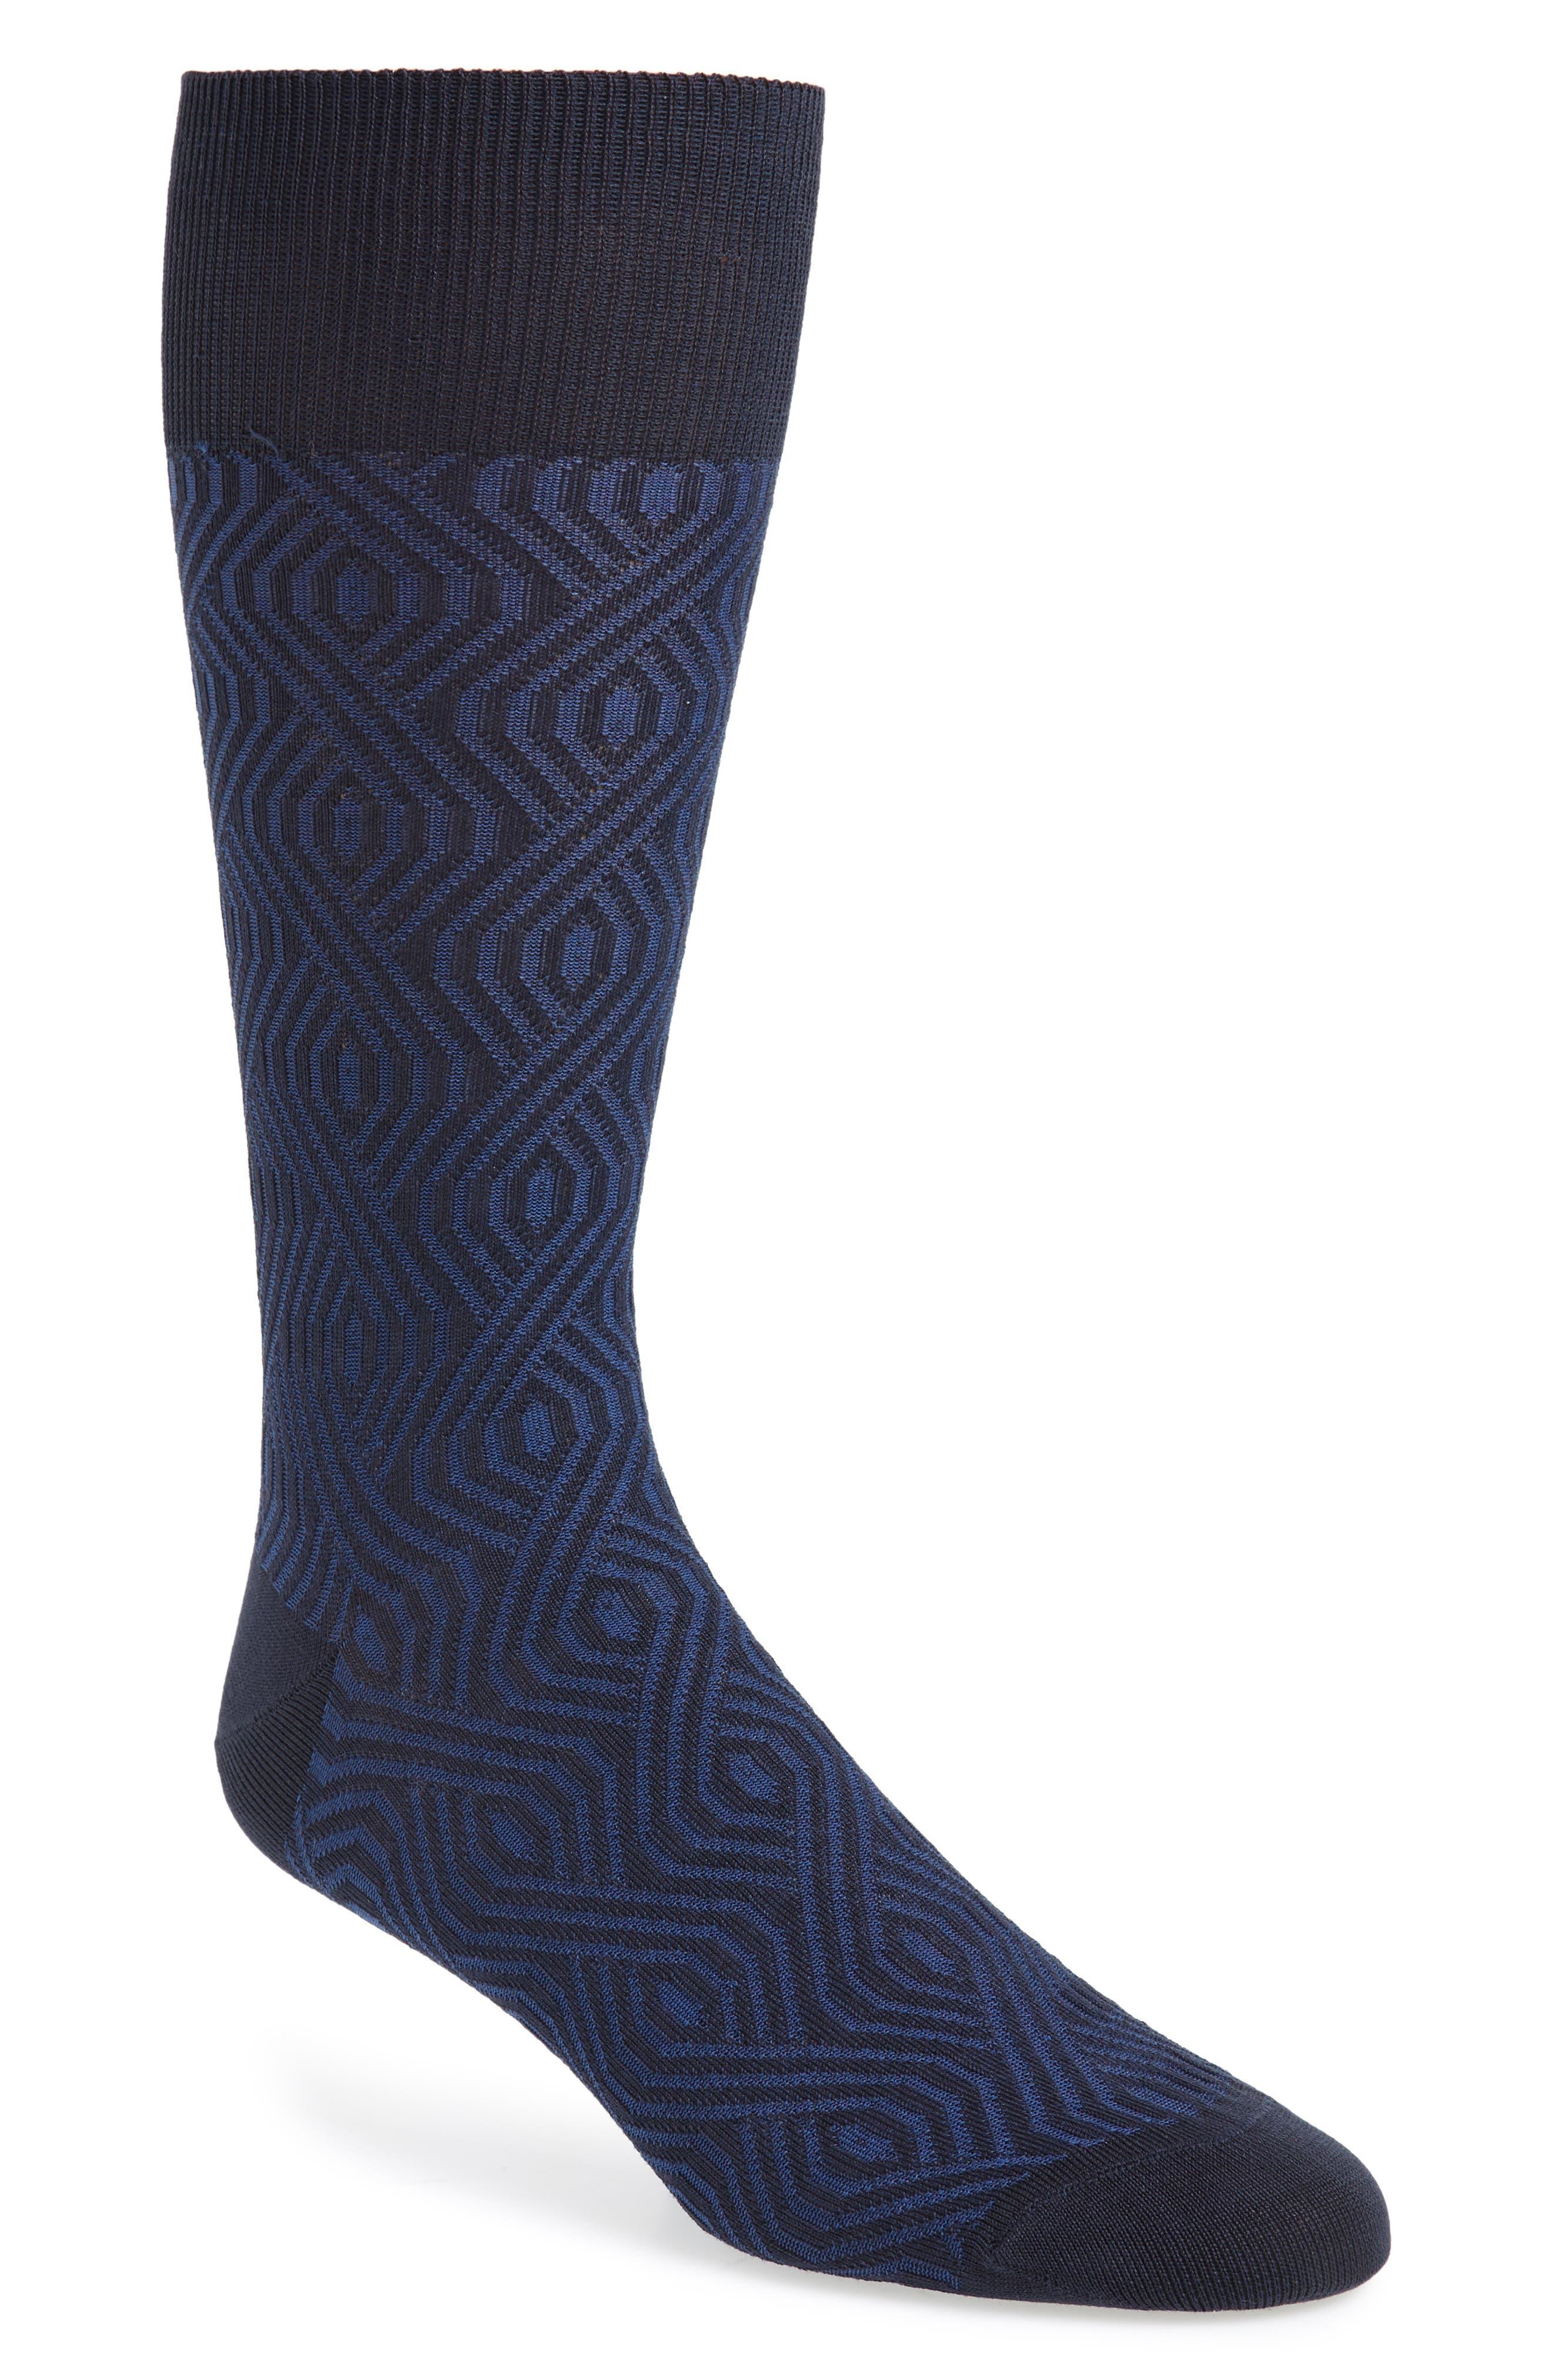 Geometric Socks,                         Main,                         color, 410